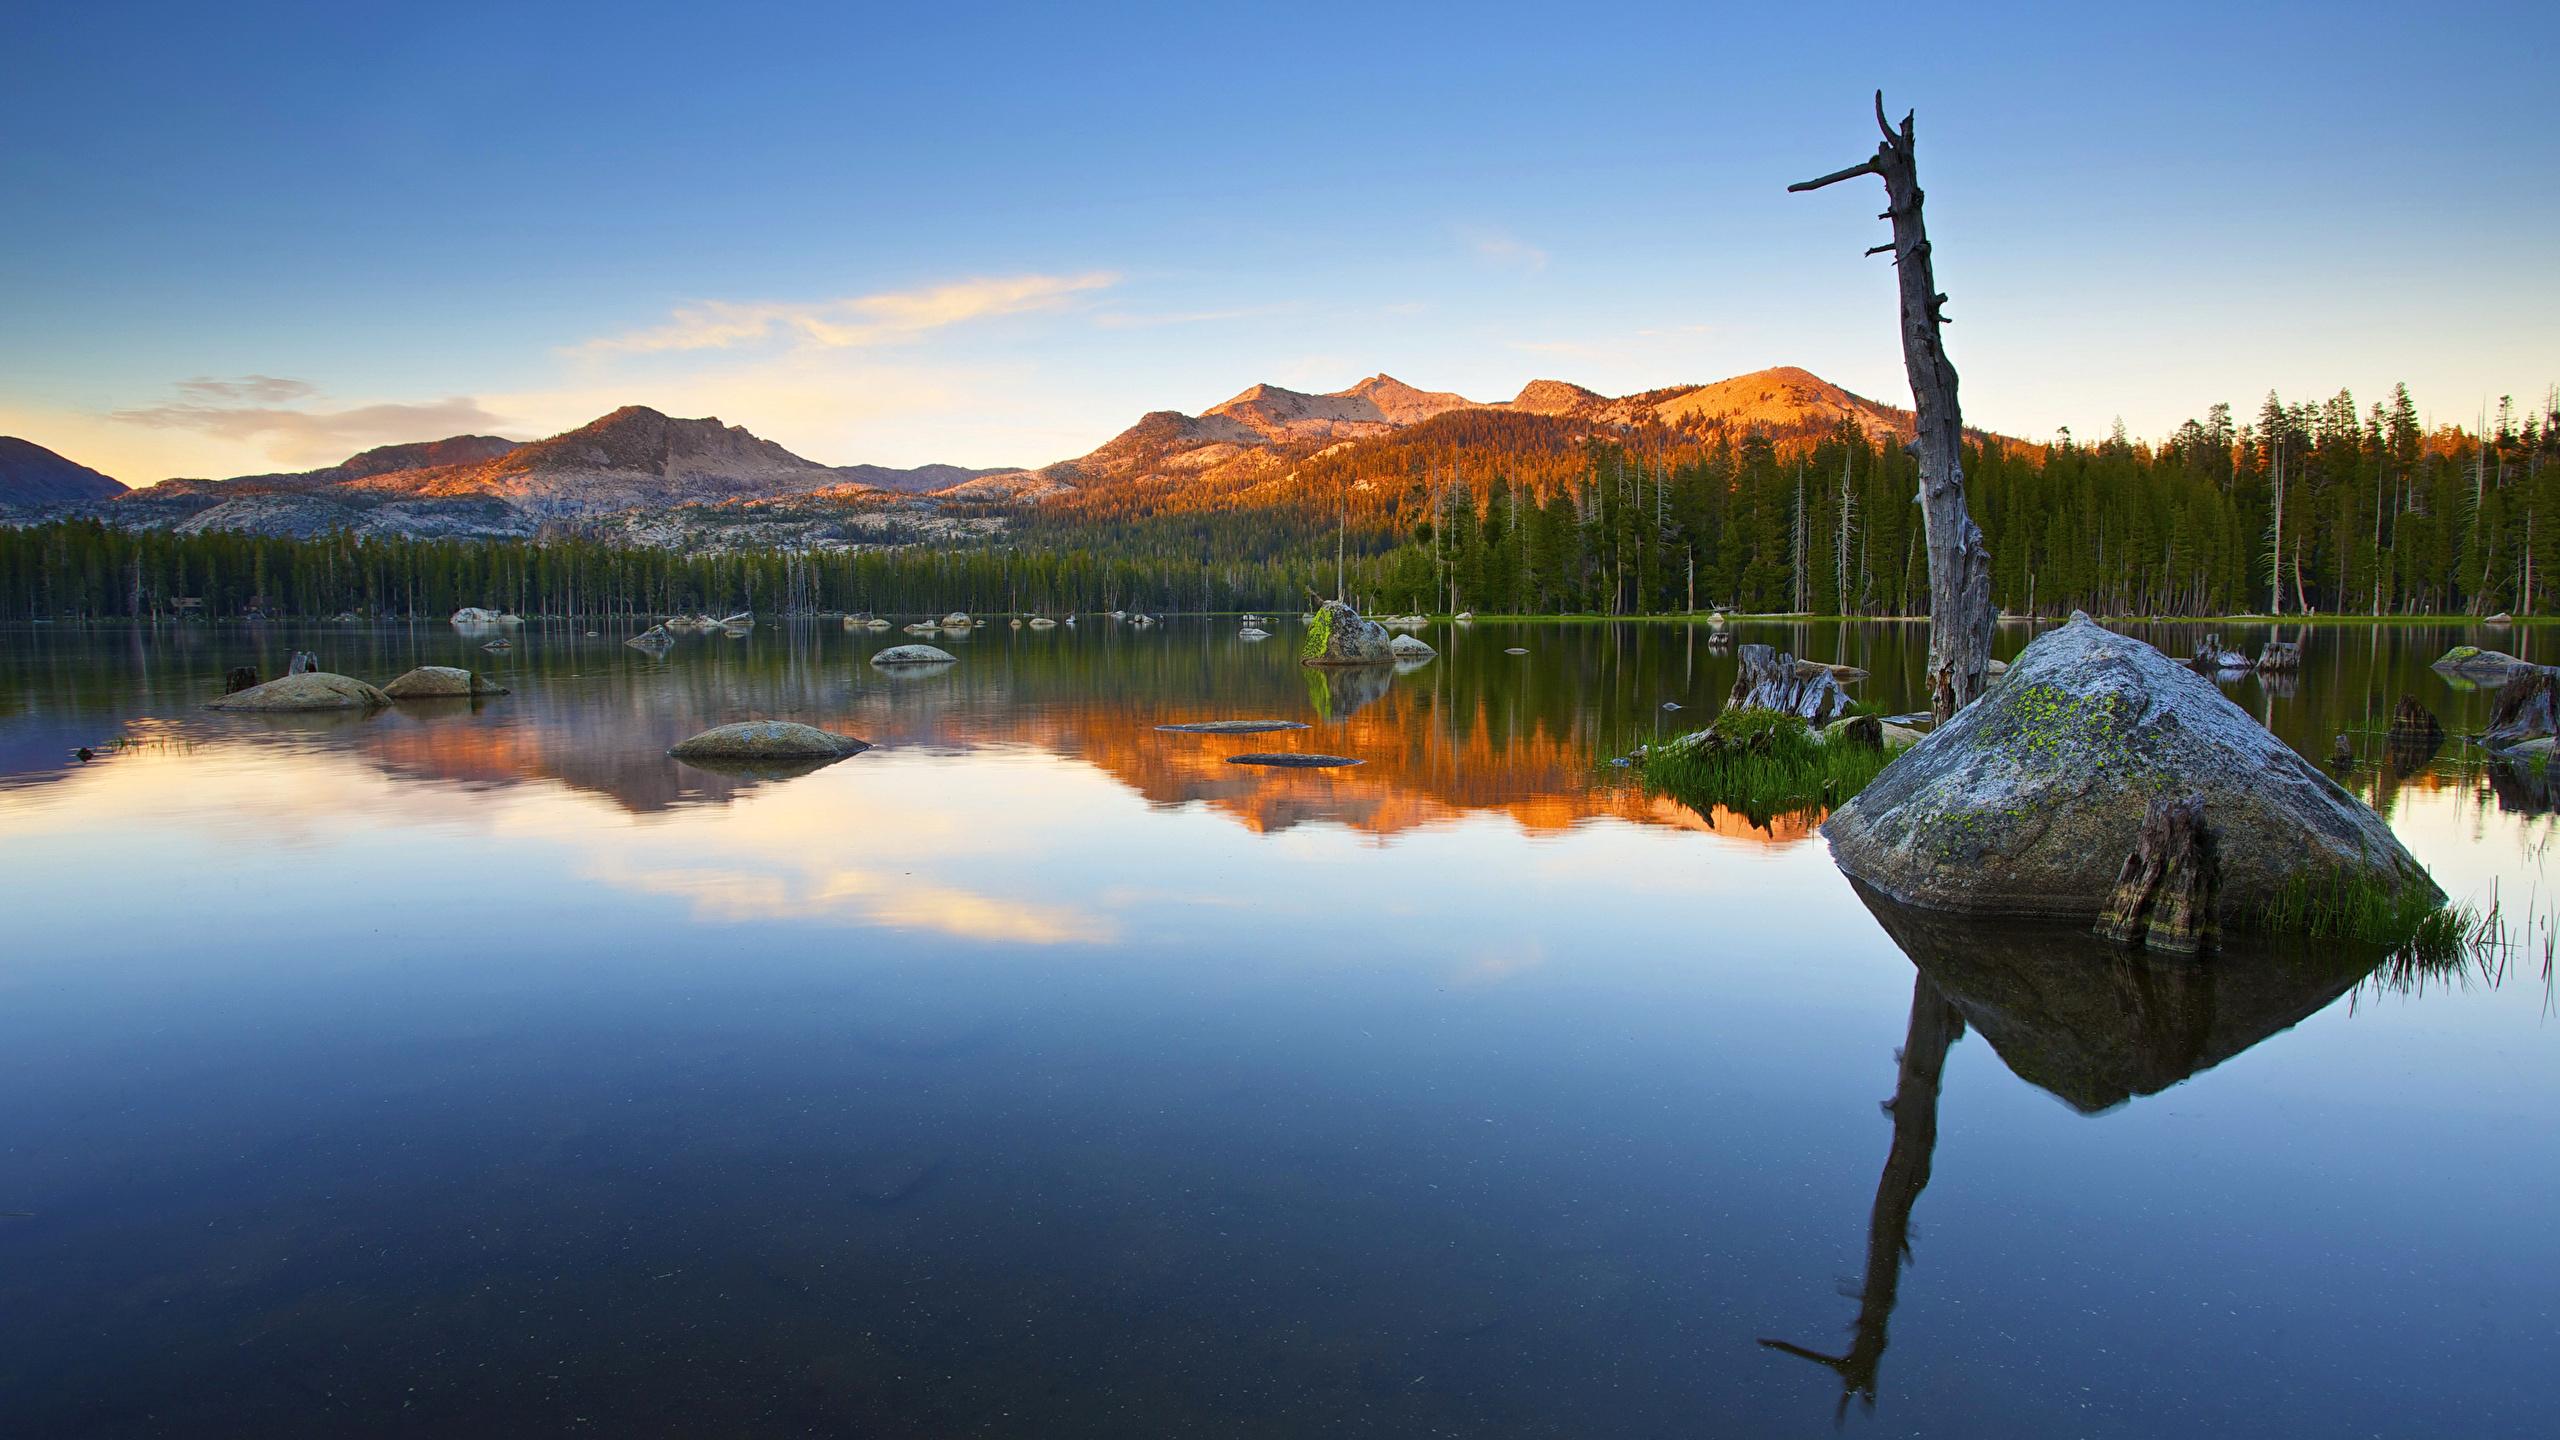 Images Nevada California USA Alpenglow Nature mountain 2560x1440 2560x1440